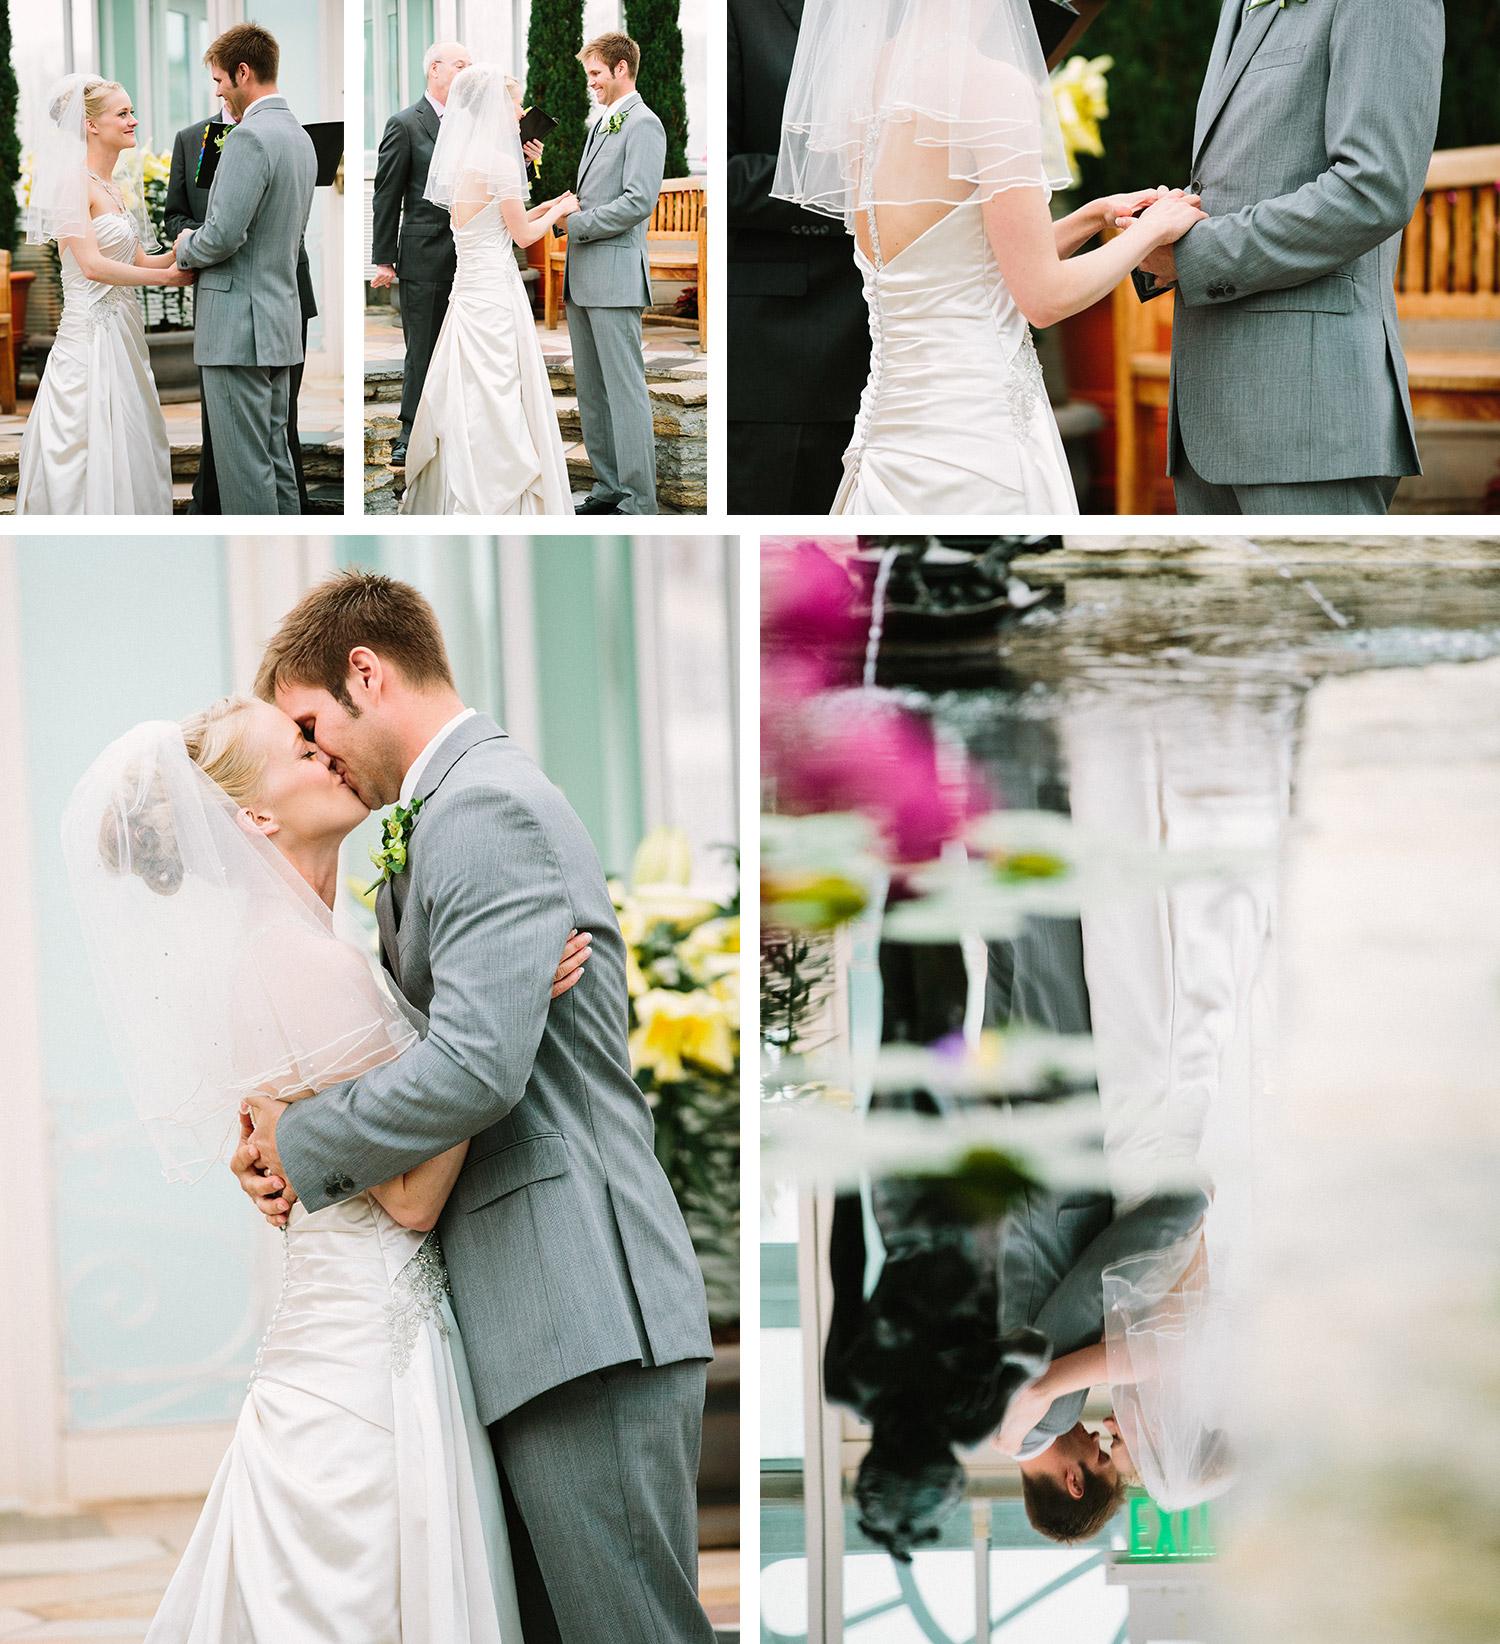 17_Saint_Paul_Hotel_Landmark_Center_wedding.jpg